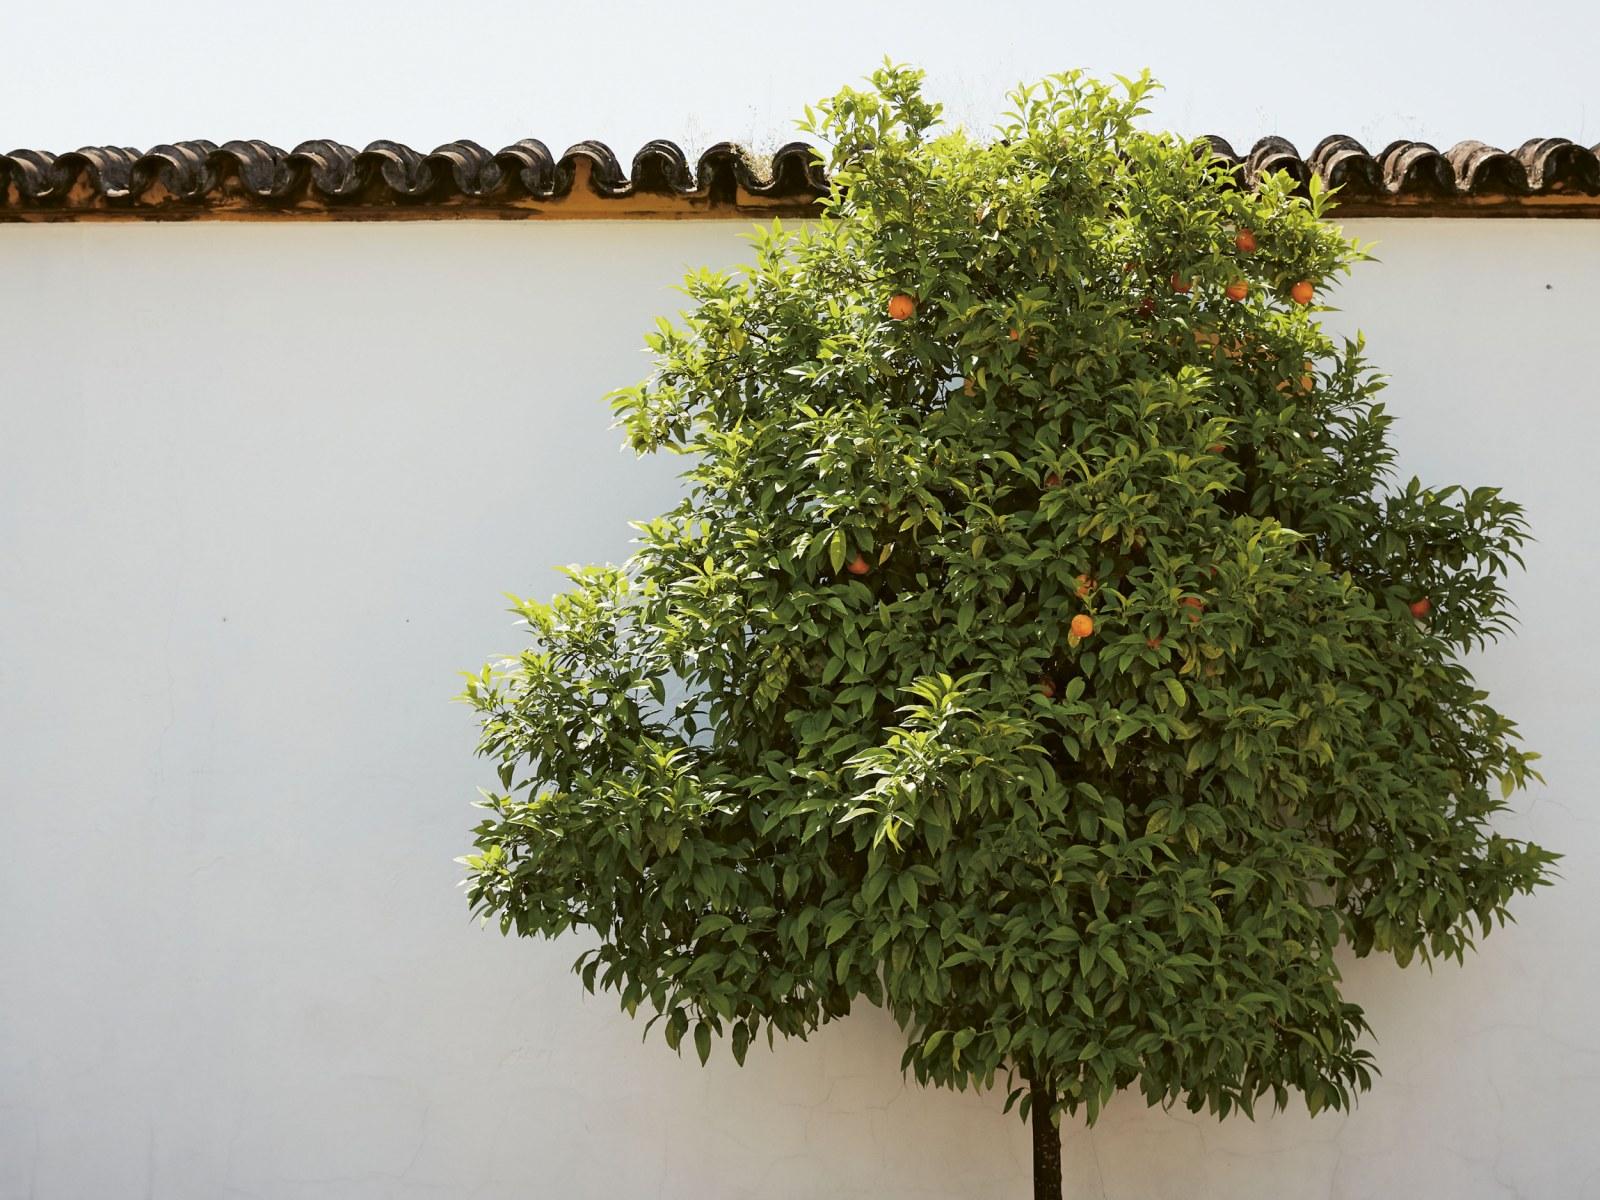 Amazing Andalusia: Spain's Hidden Secret Revealed